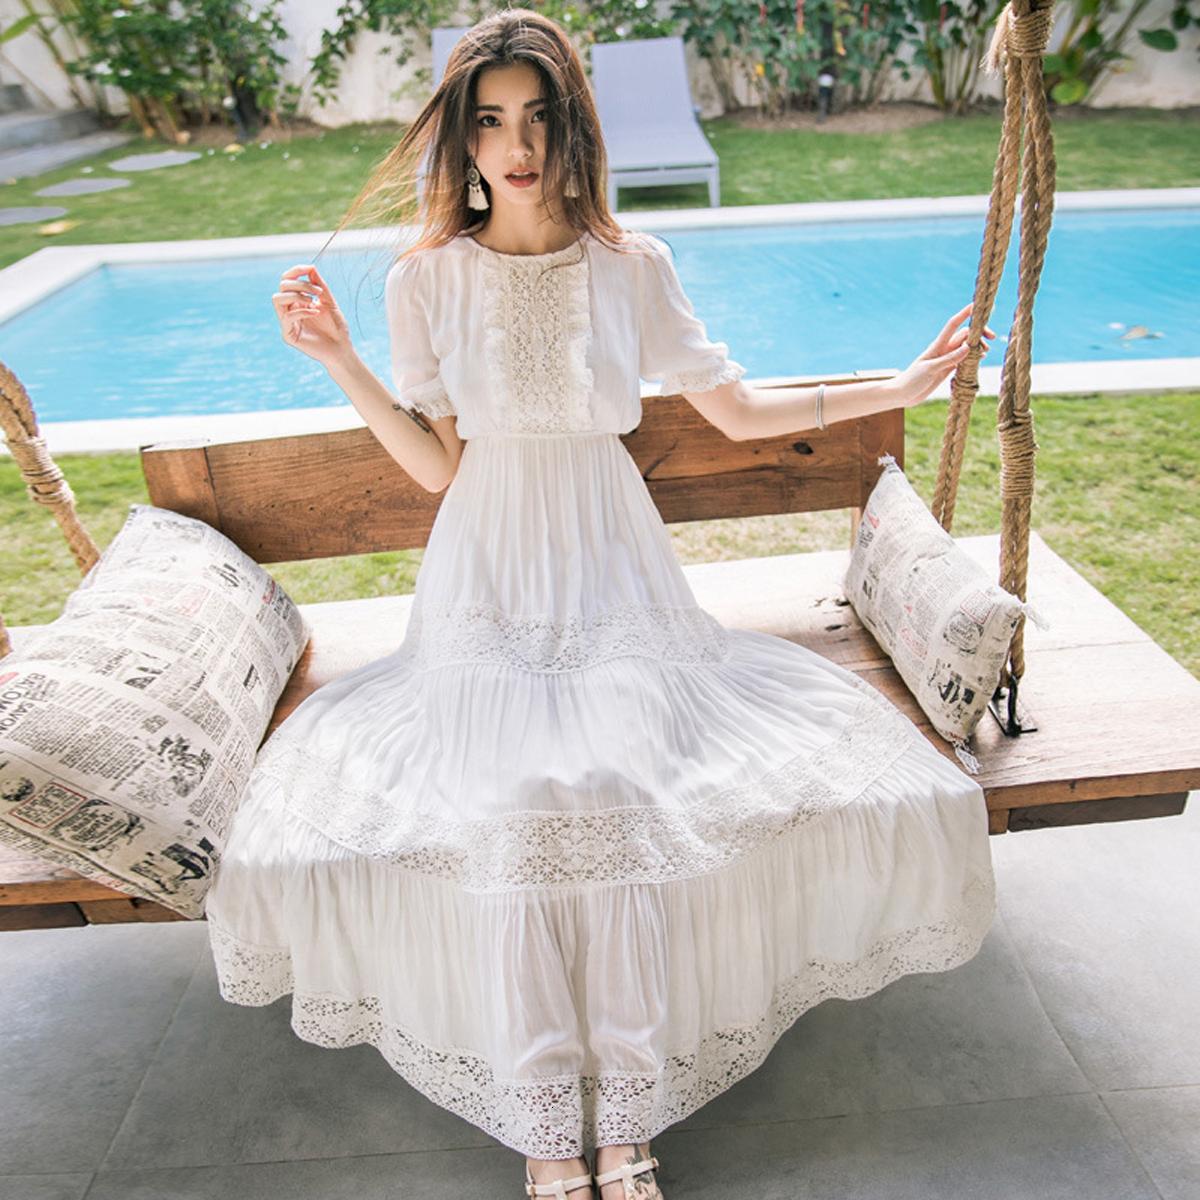 New Bohemian Hippie Big Swing Holiday Beach Dress O-Neck Half Sleeve Spring Summer Dresses Women White Patchwork Lace Dress 2